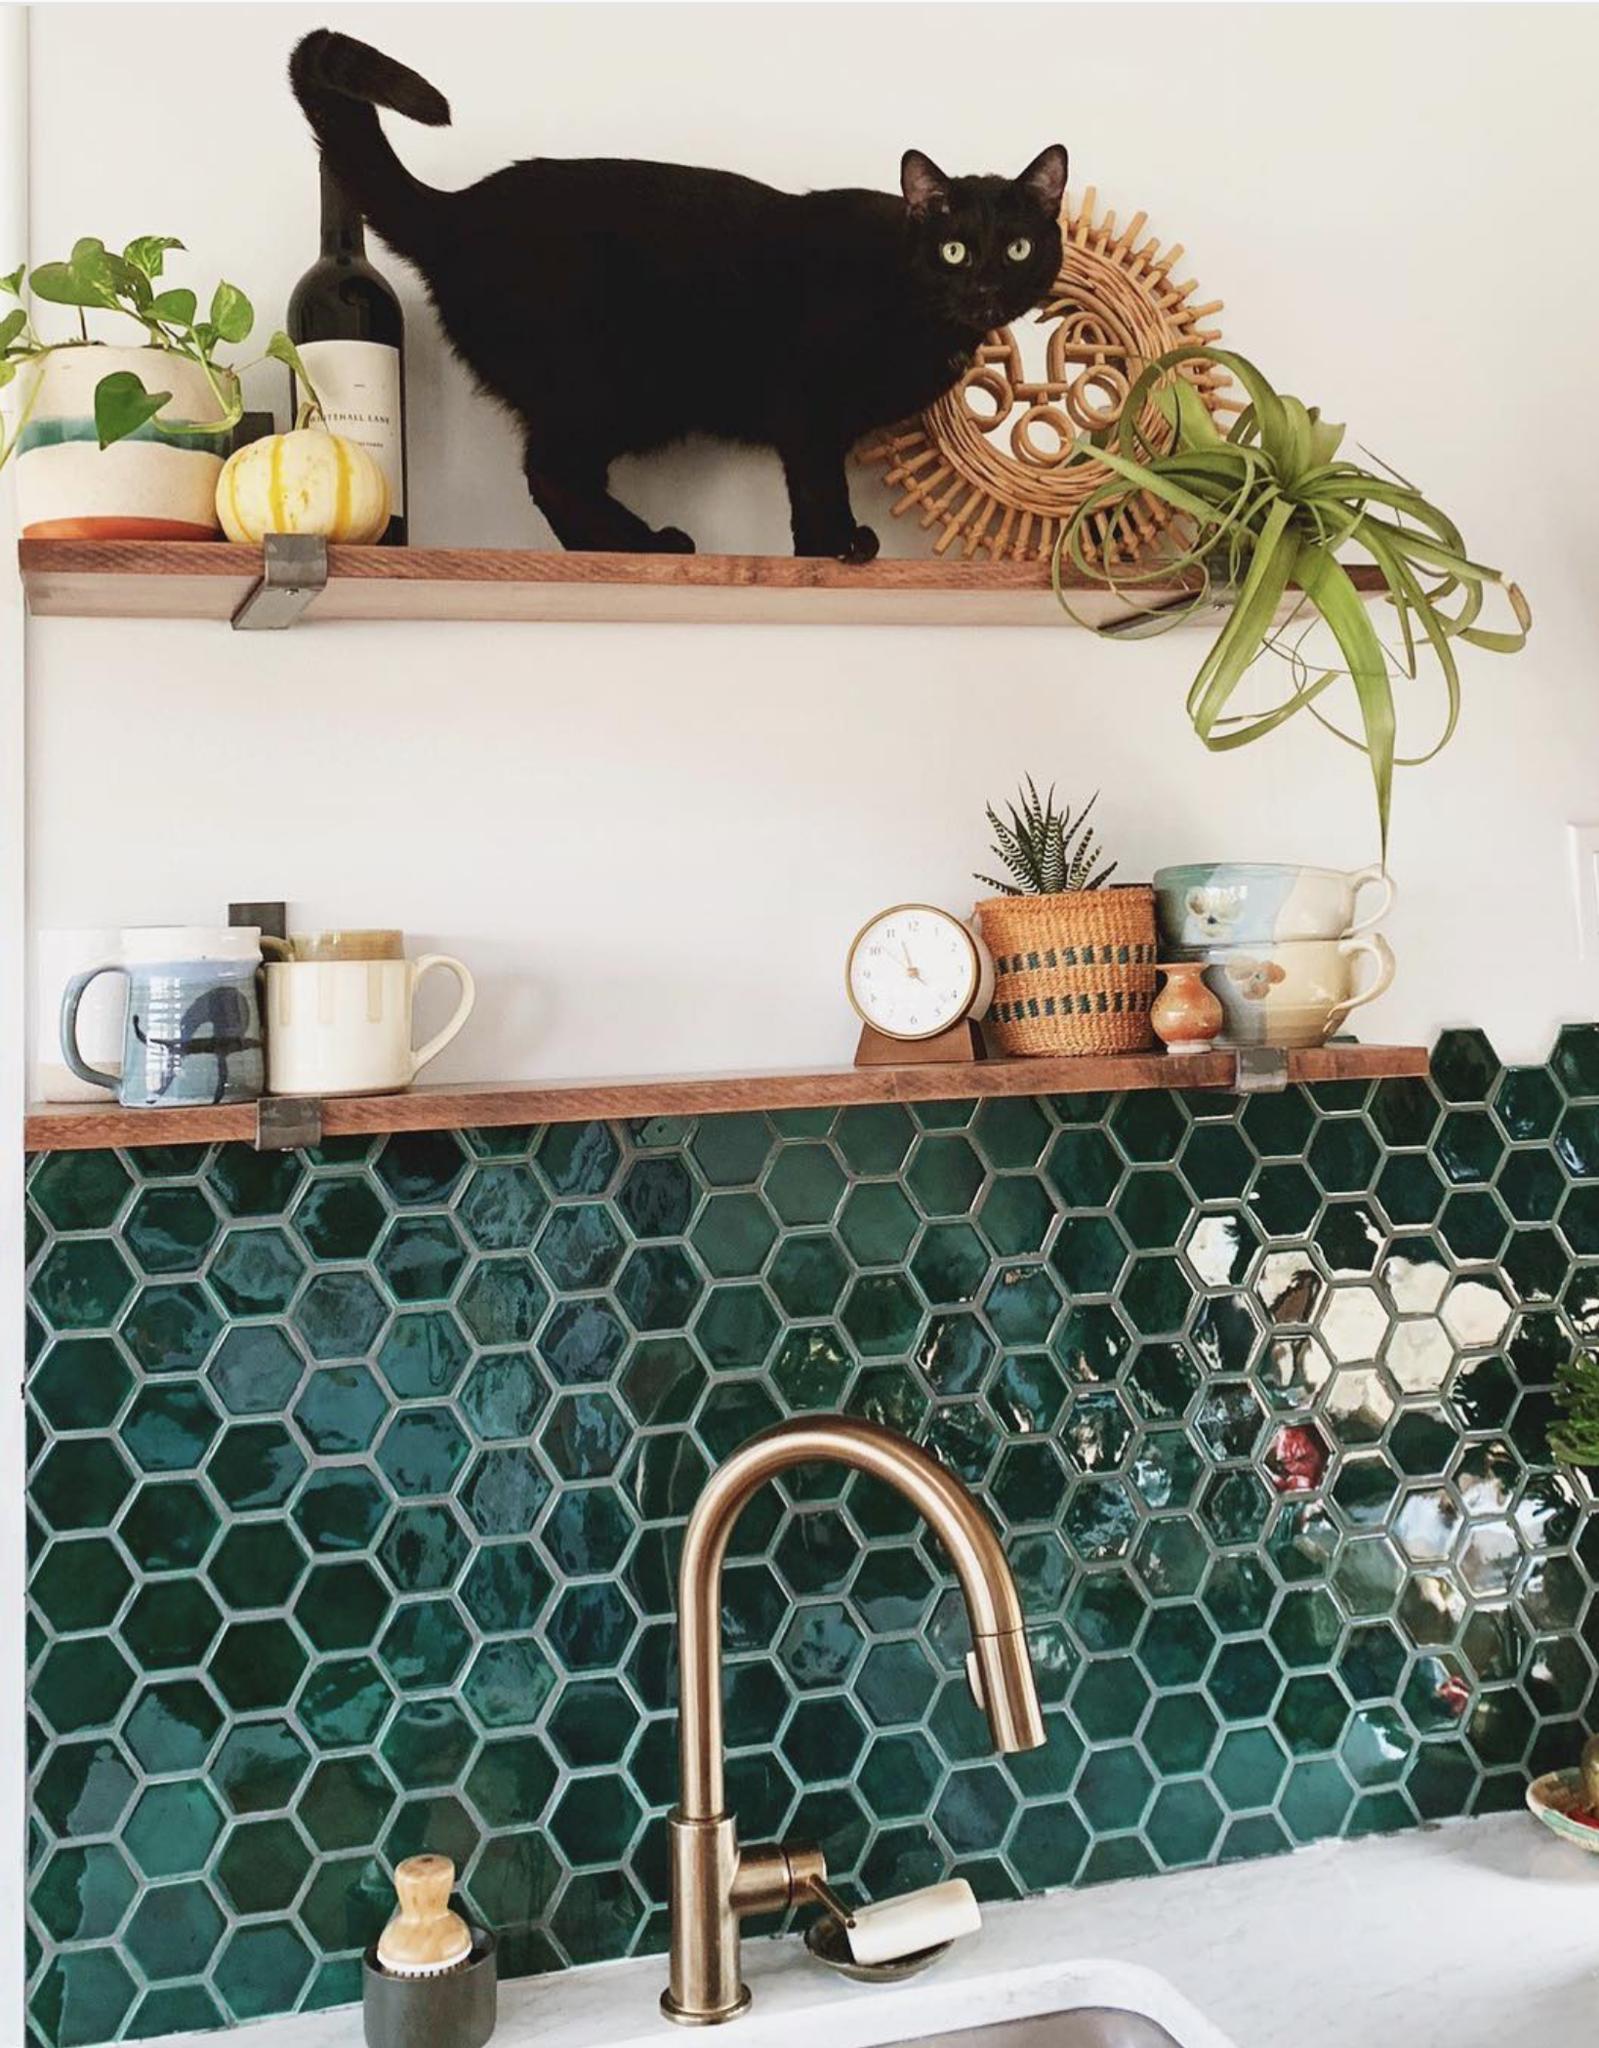 11 Kitchen Backsplashes To Wow Your Guests Kitchen Tiles Design Kitchen Tiles Backsplash Hexagon Tile Backsplash